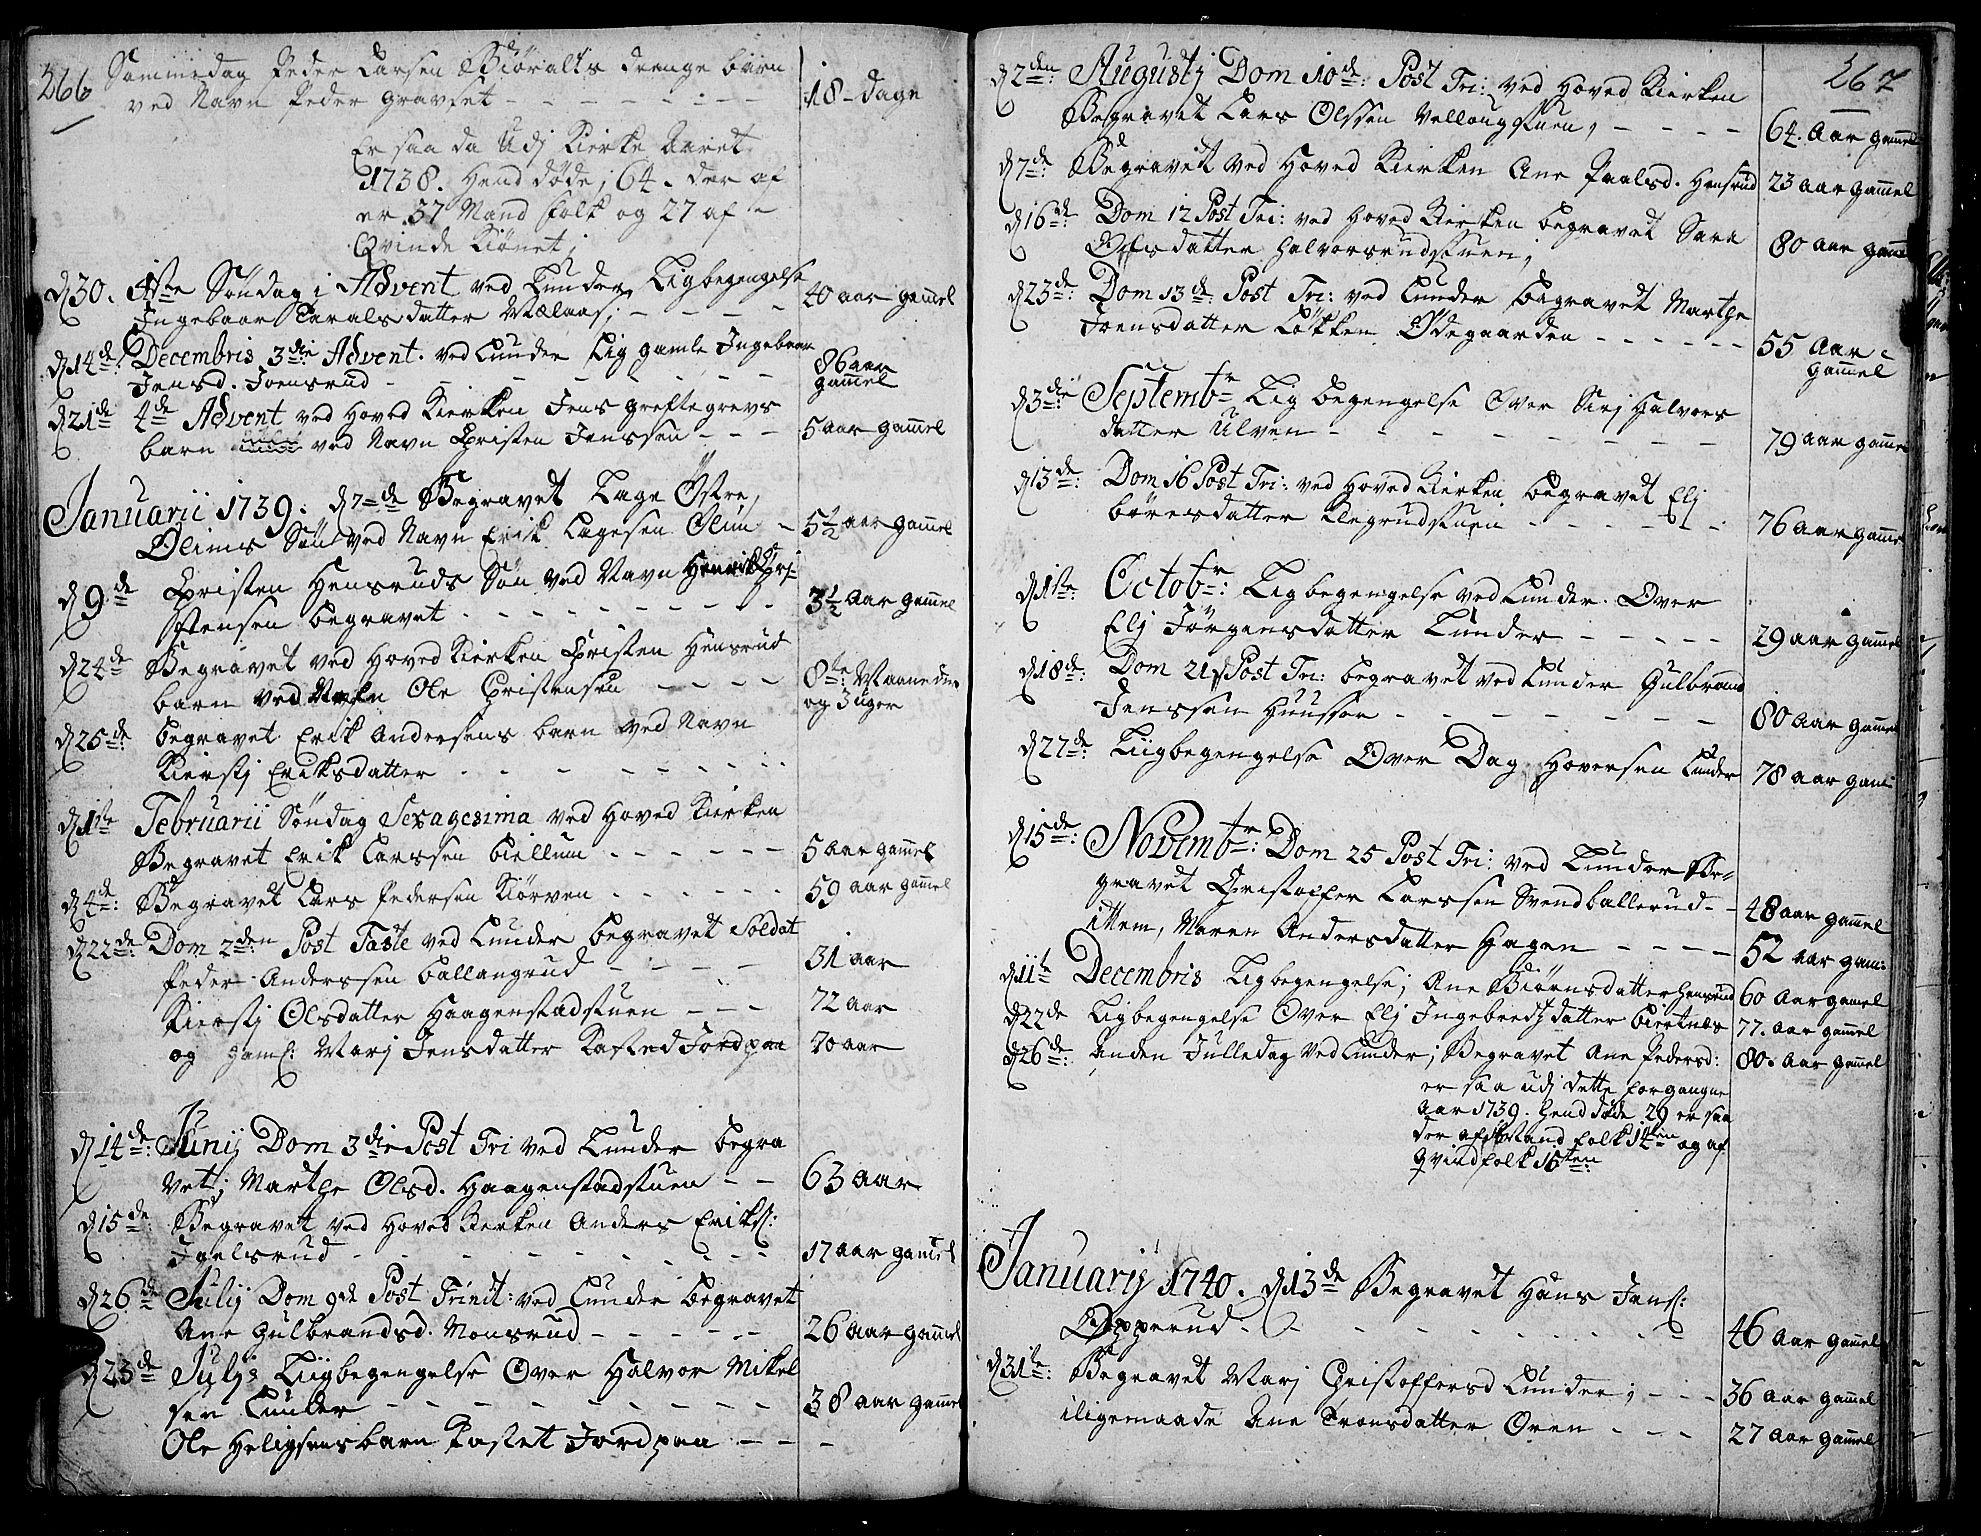 SAH, Jevnaker prestekontor, Ministerialbok nr. 2, 1725-1751, s. 266-267